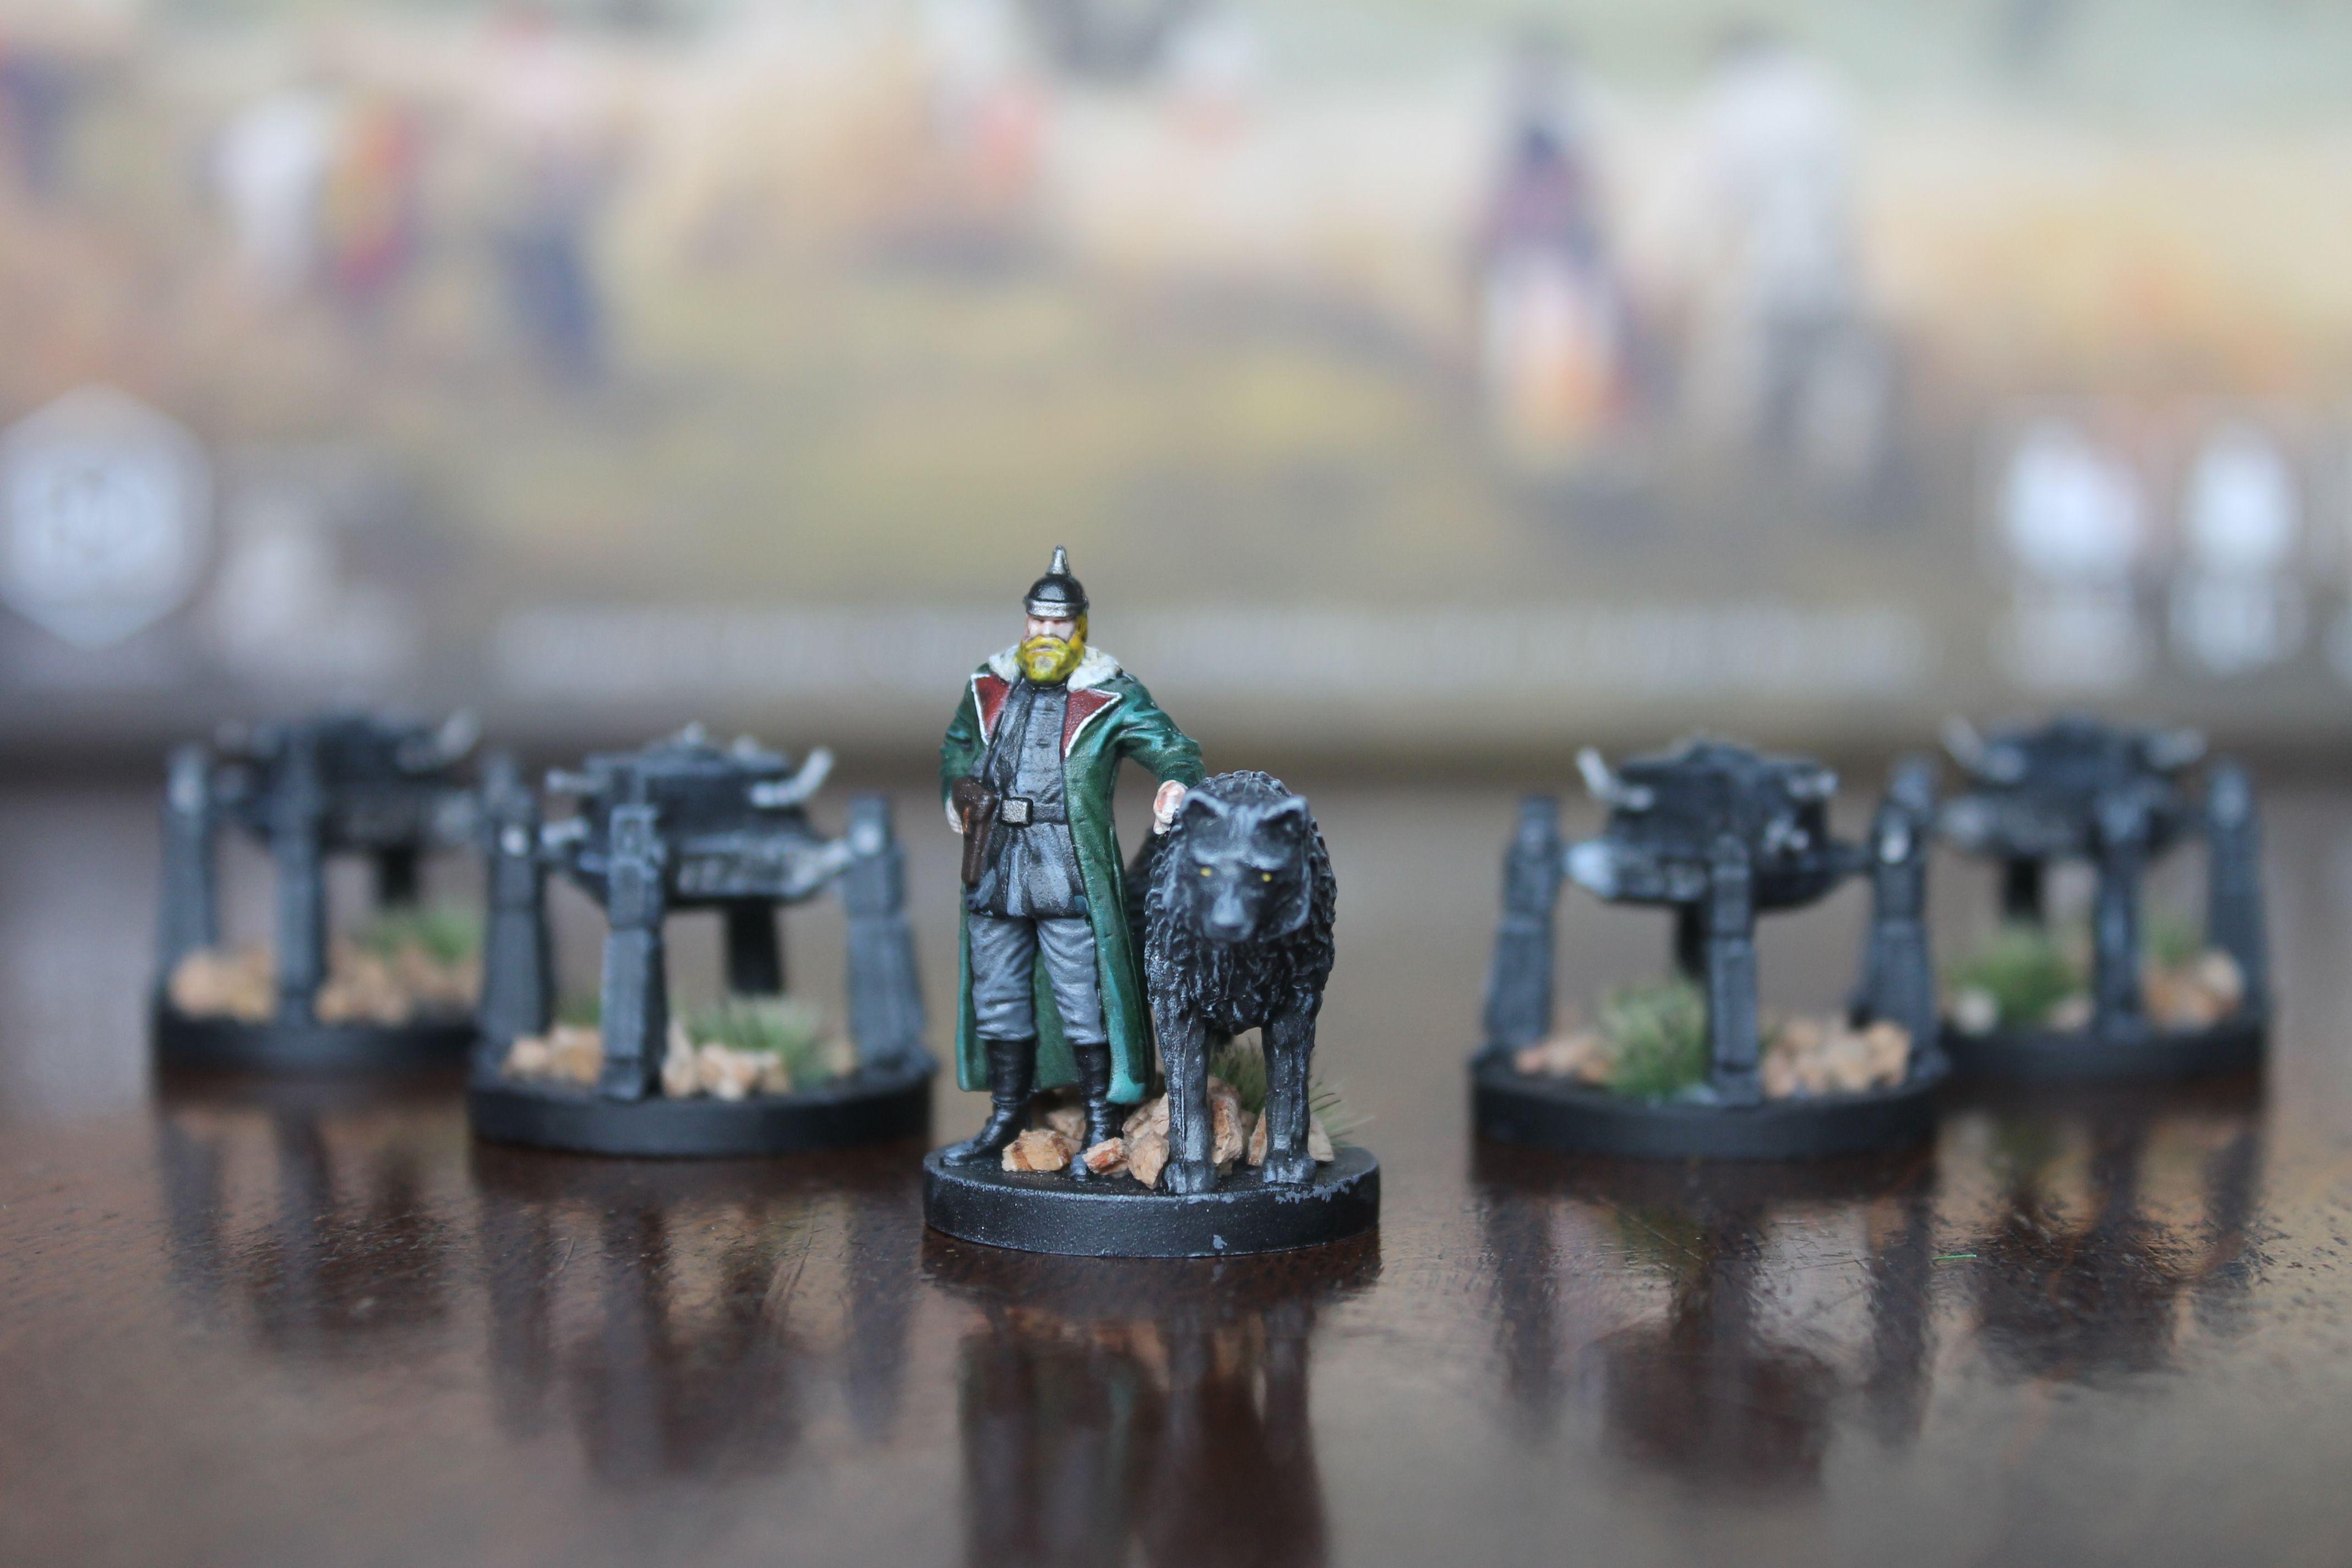 Scythe Painted Miniatures (Saxony Empire) Miniatures